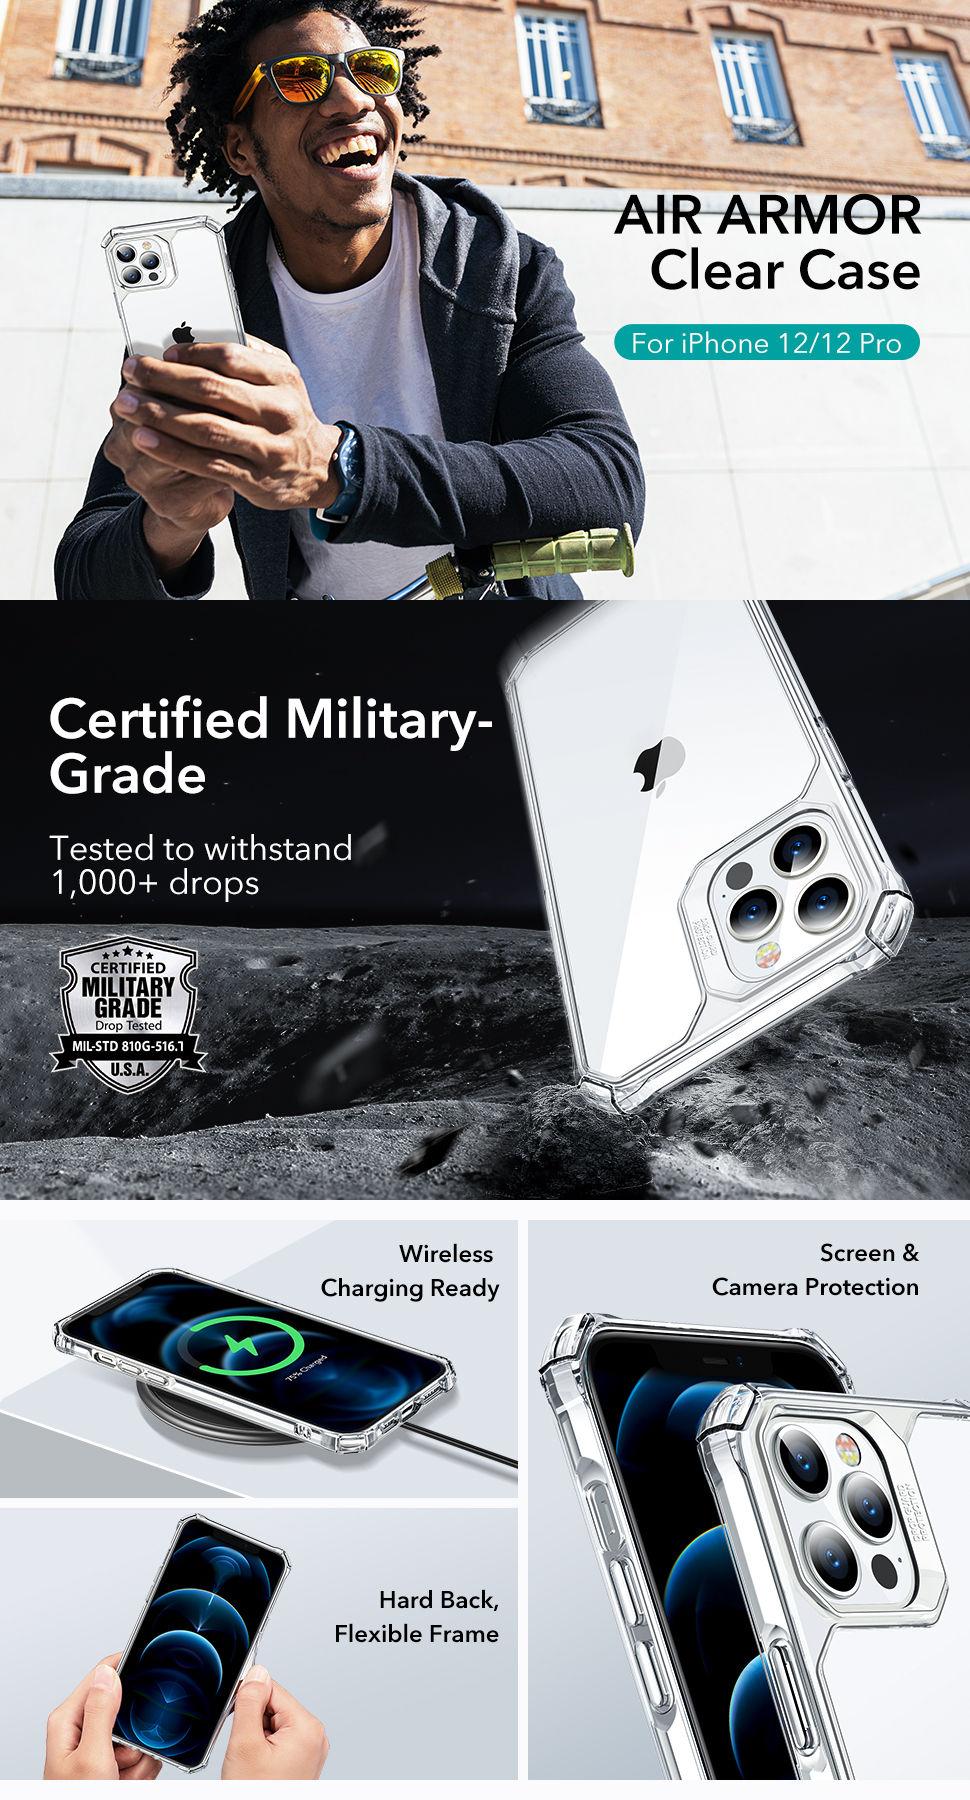 Gohub Shop - ESR Air Armor - Clear case for iPhone 12/12 Pro